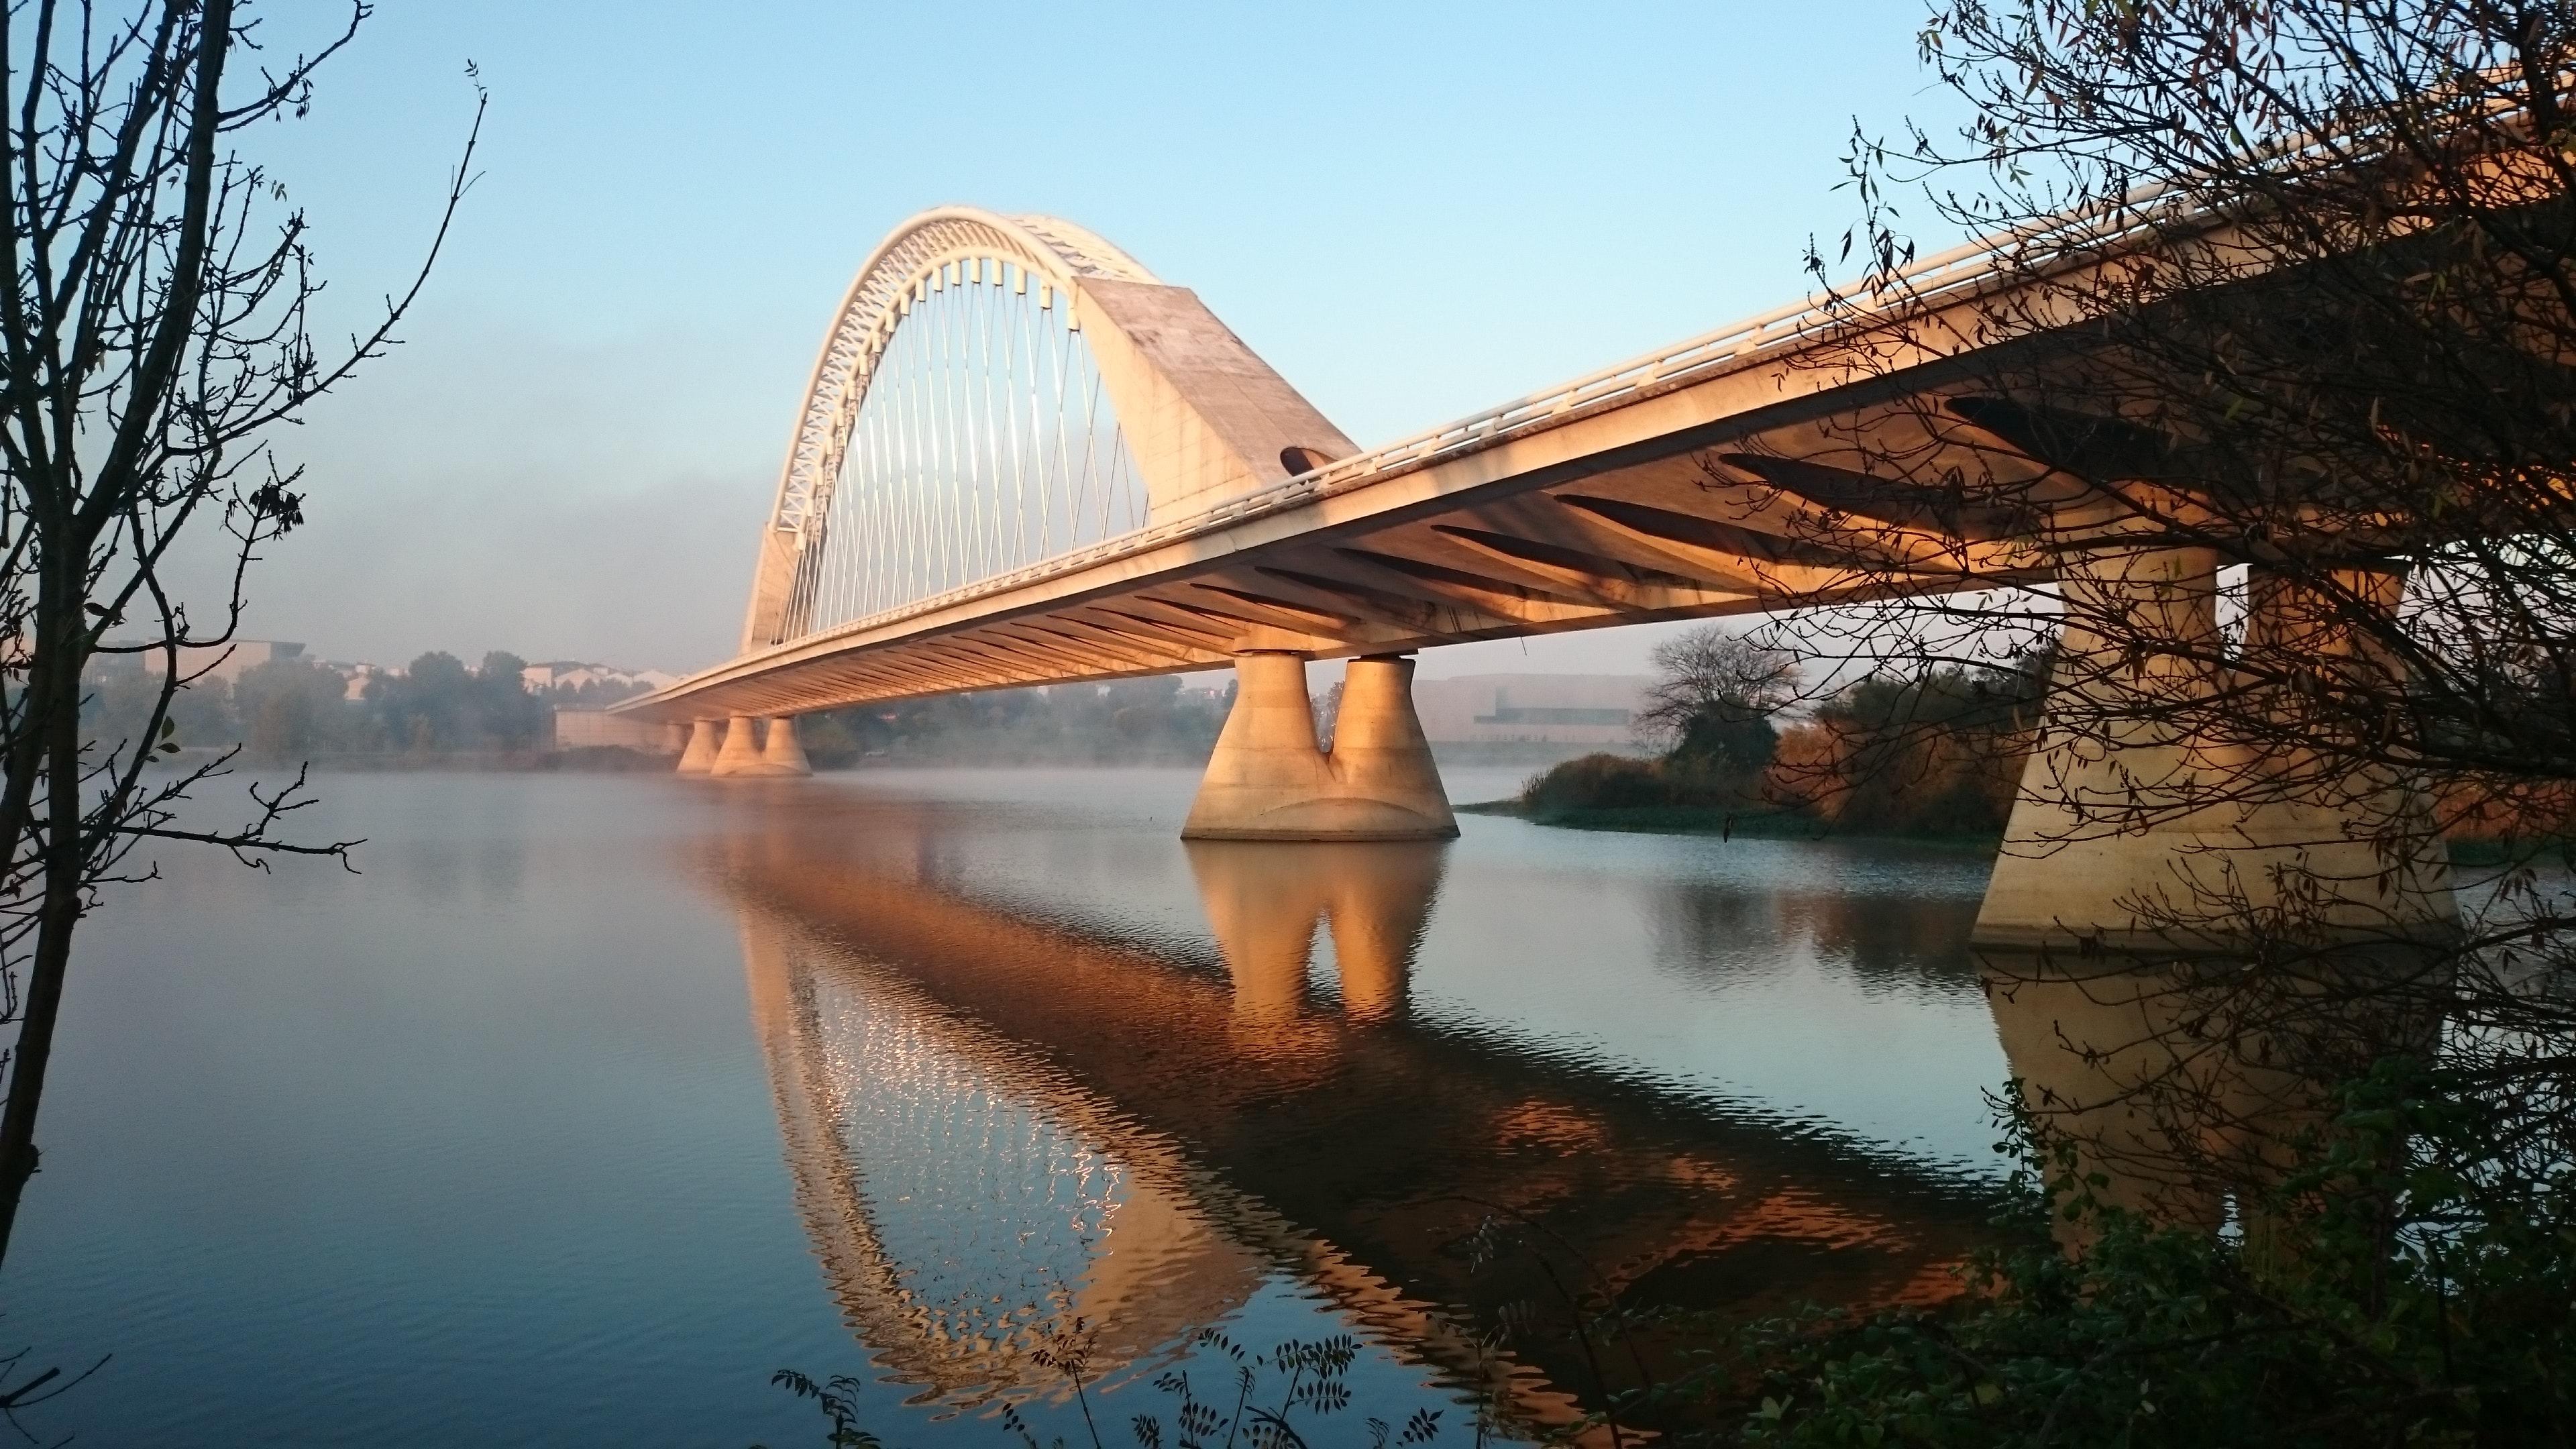 architecture-bowstring-arch-bridge-bridge-77630